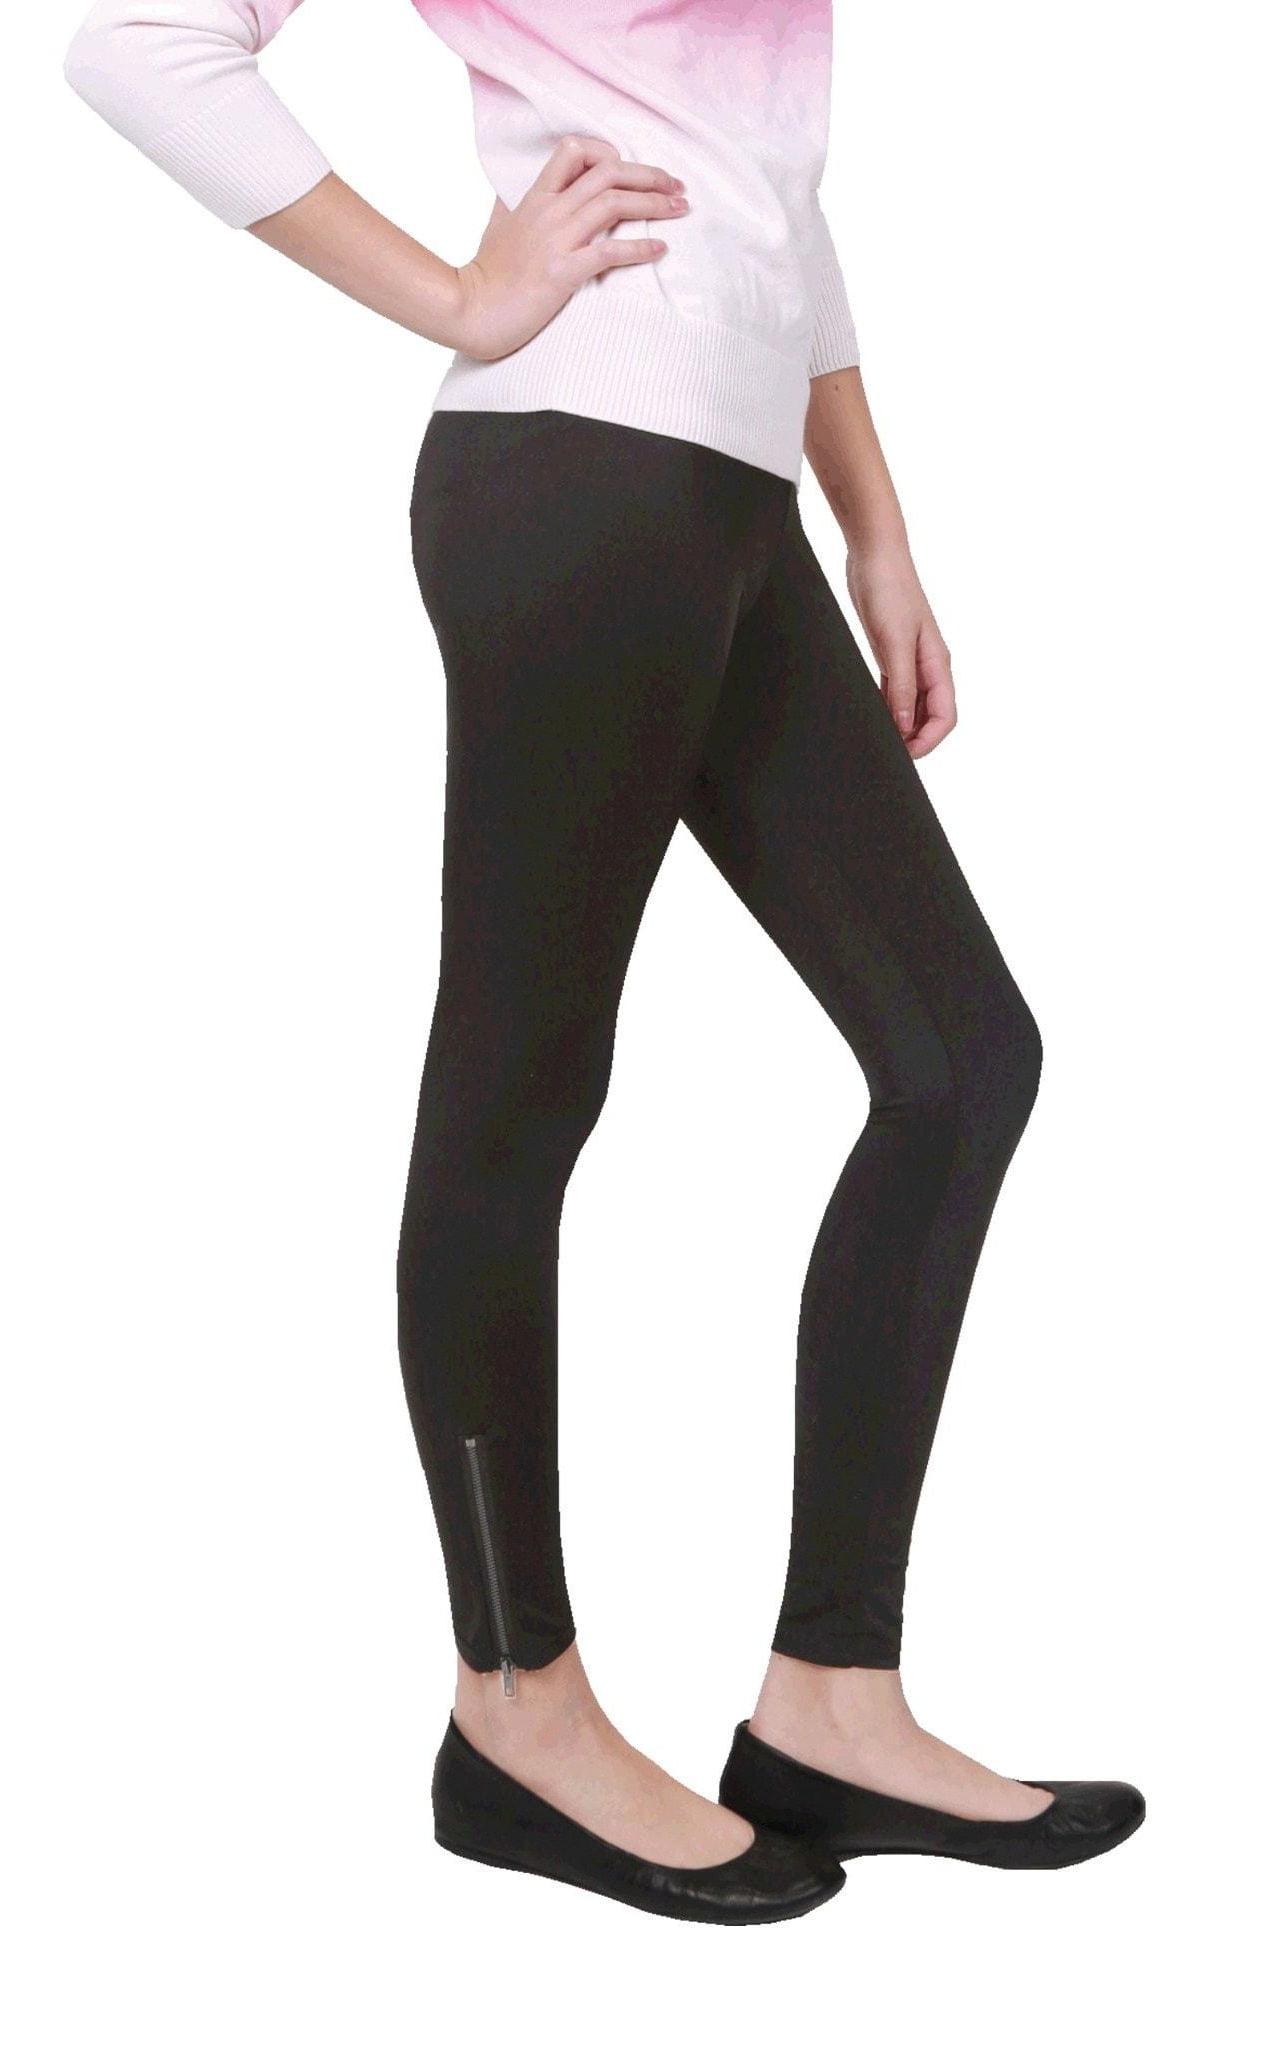 MeMoi Ankle Zip Leggings Buy Girls Leggings